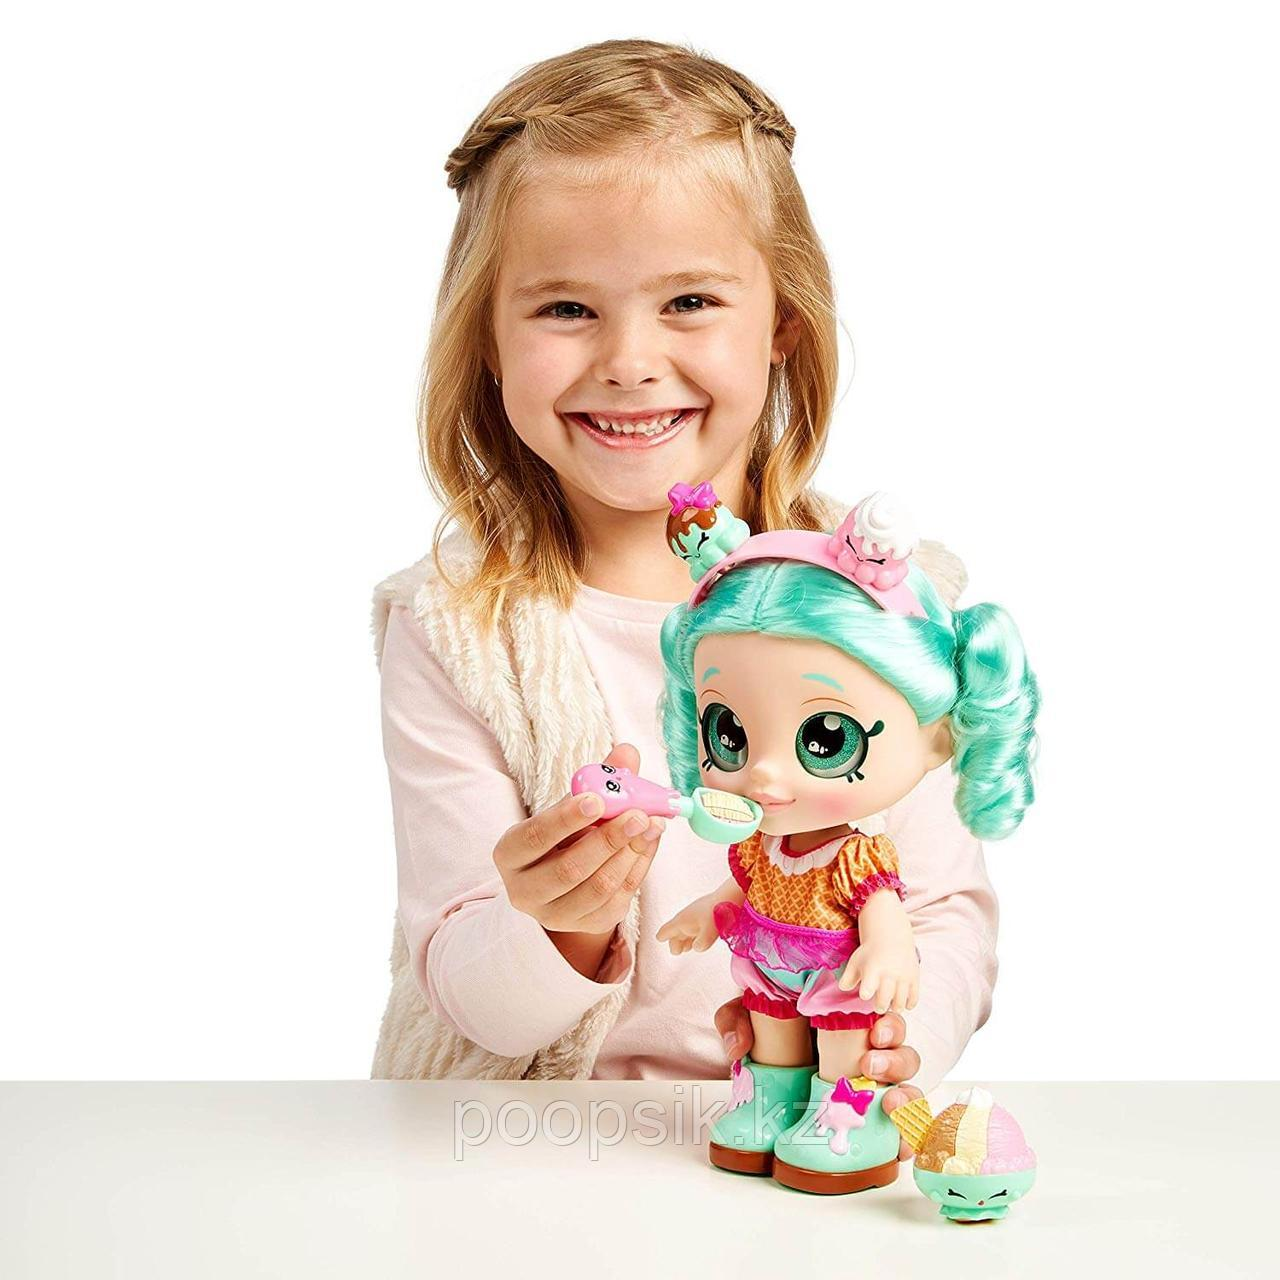 Кукла Кинди Кидс Пеппа Минт (Мороженка) 25см - фото 3